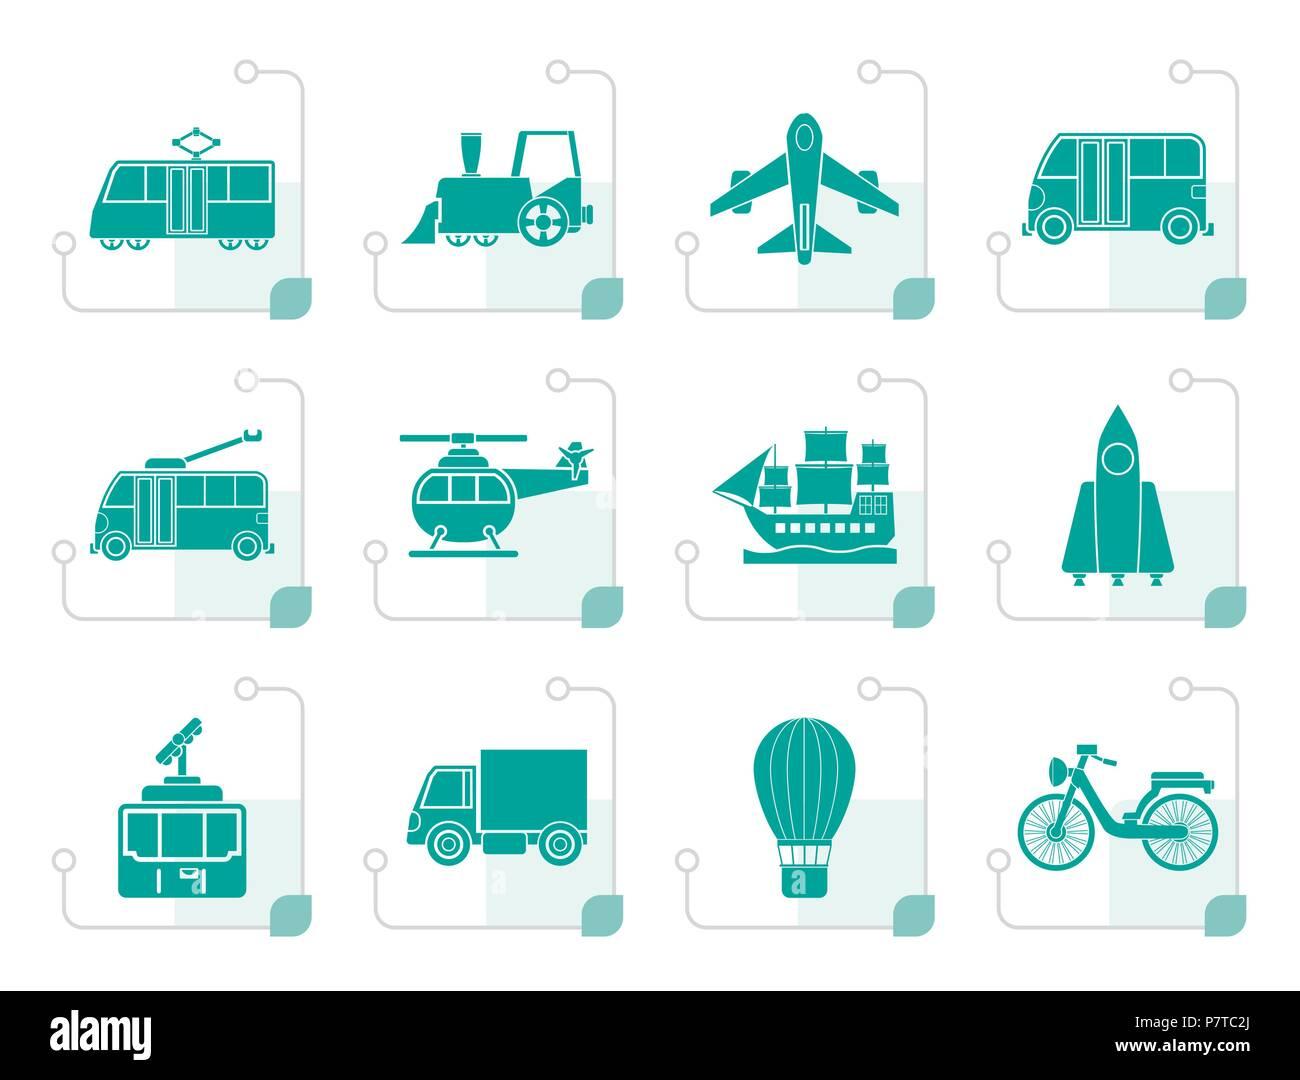 Stylized Travel and transportation icons - vector icon set - Stock Image